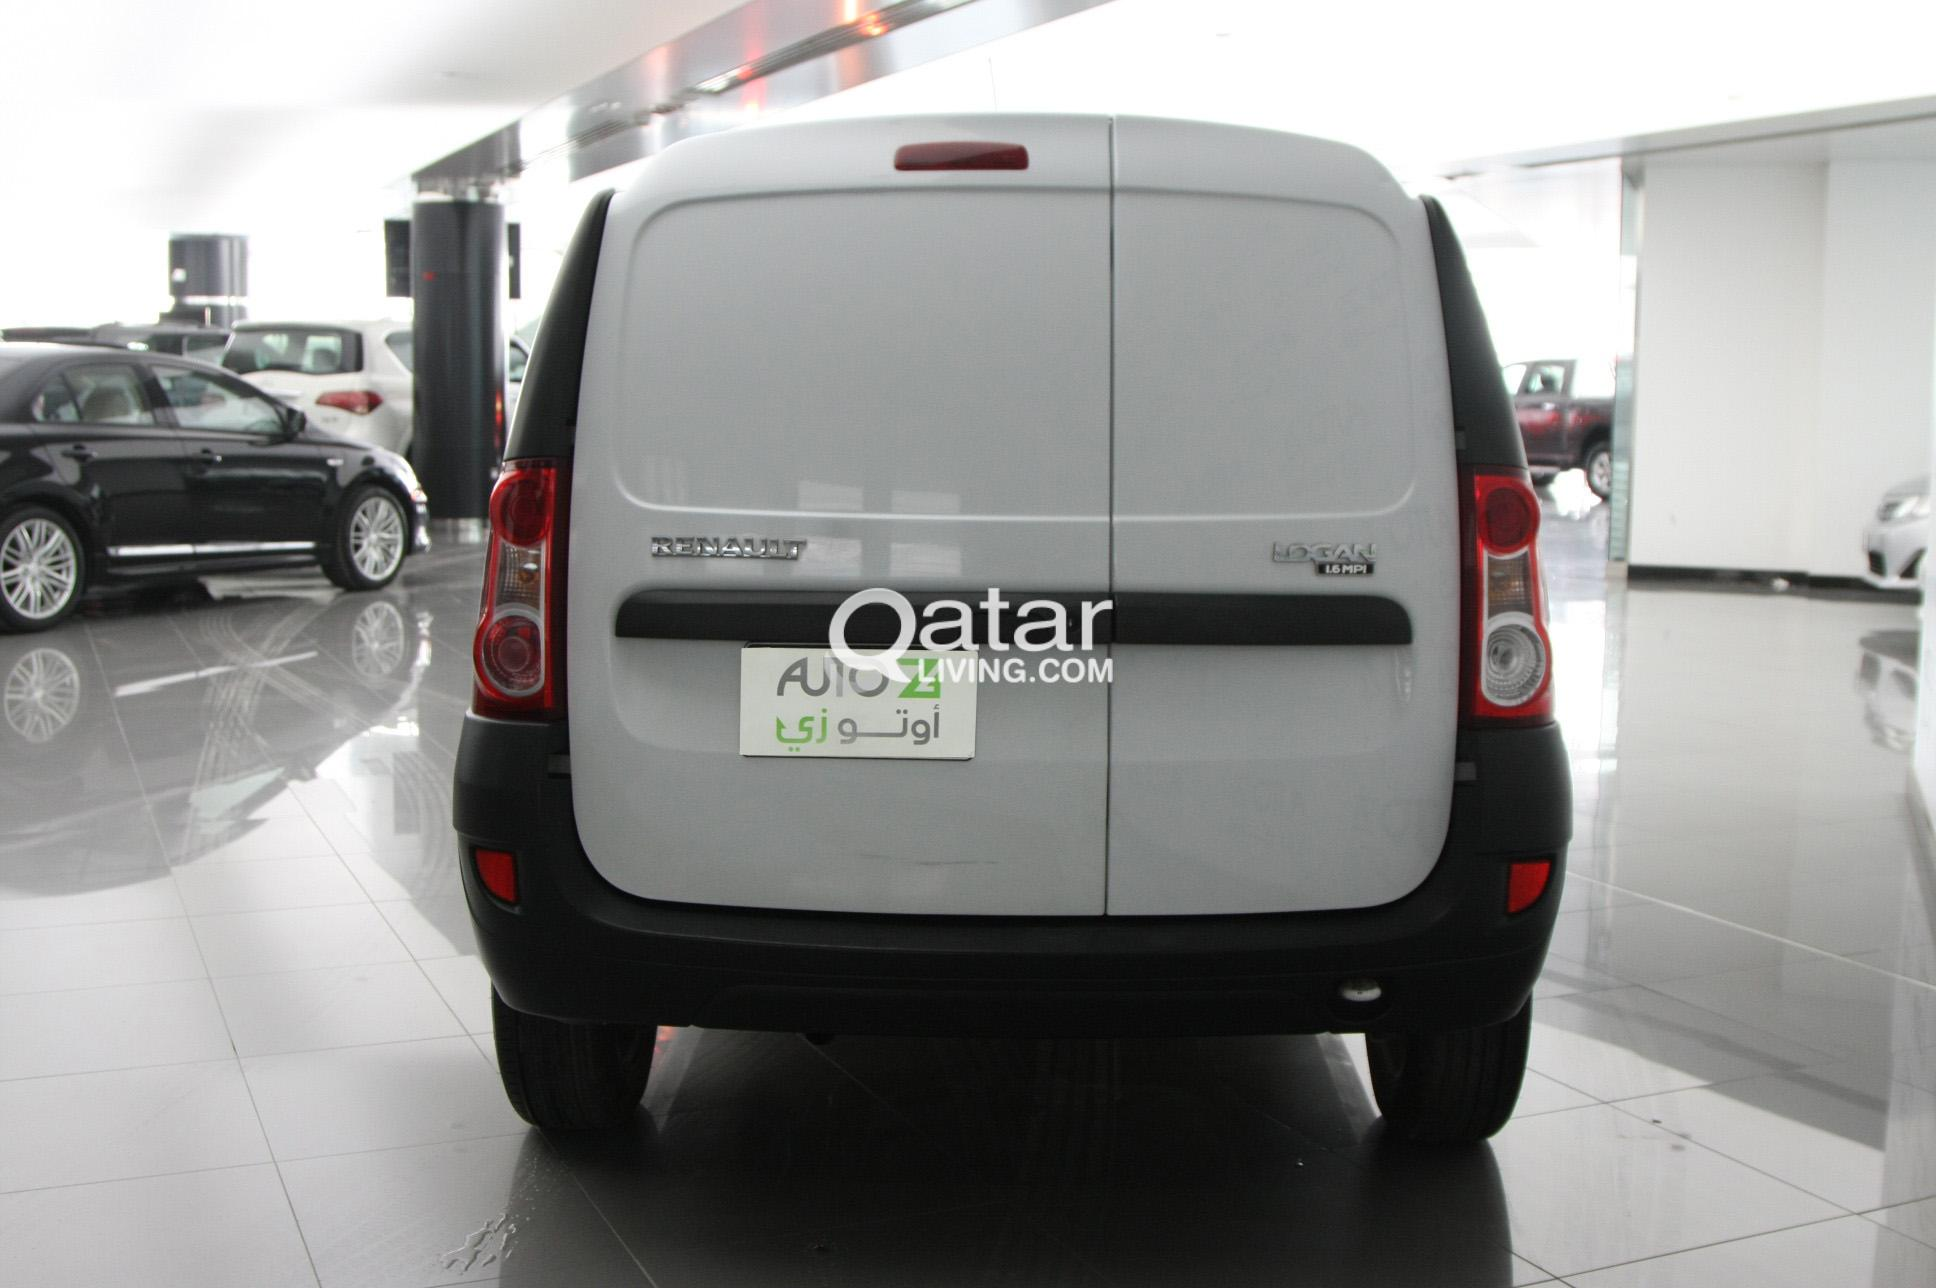 renault logan 2013 qatar living rh qatarliving com Dacia Logan 2013 Logan Class of 2013